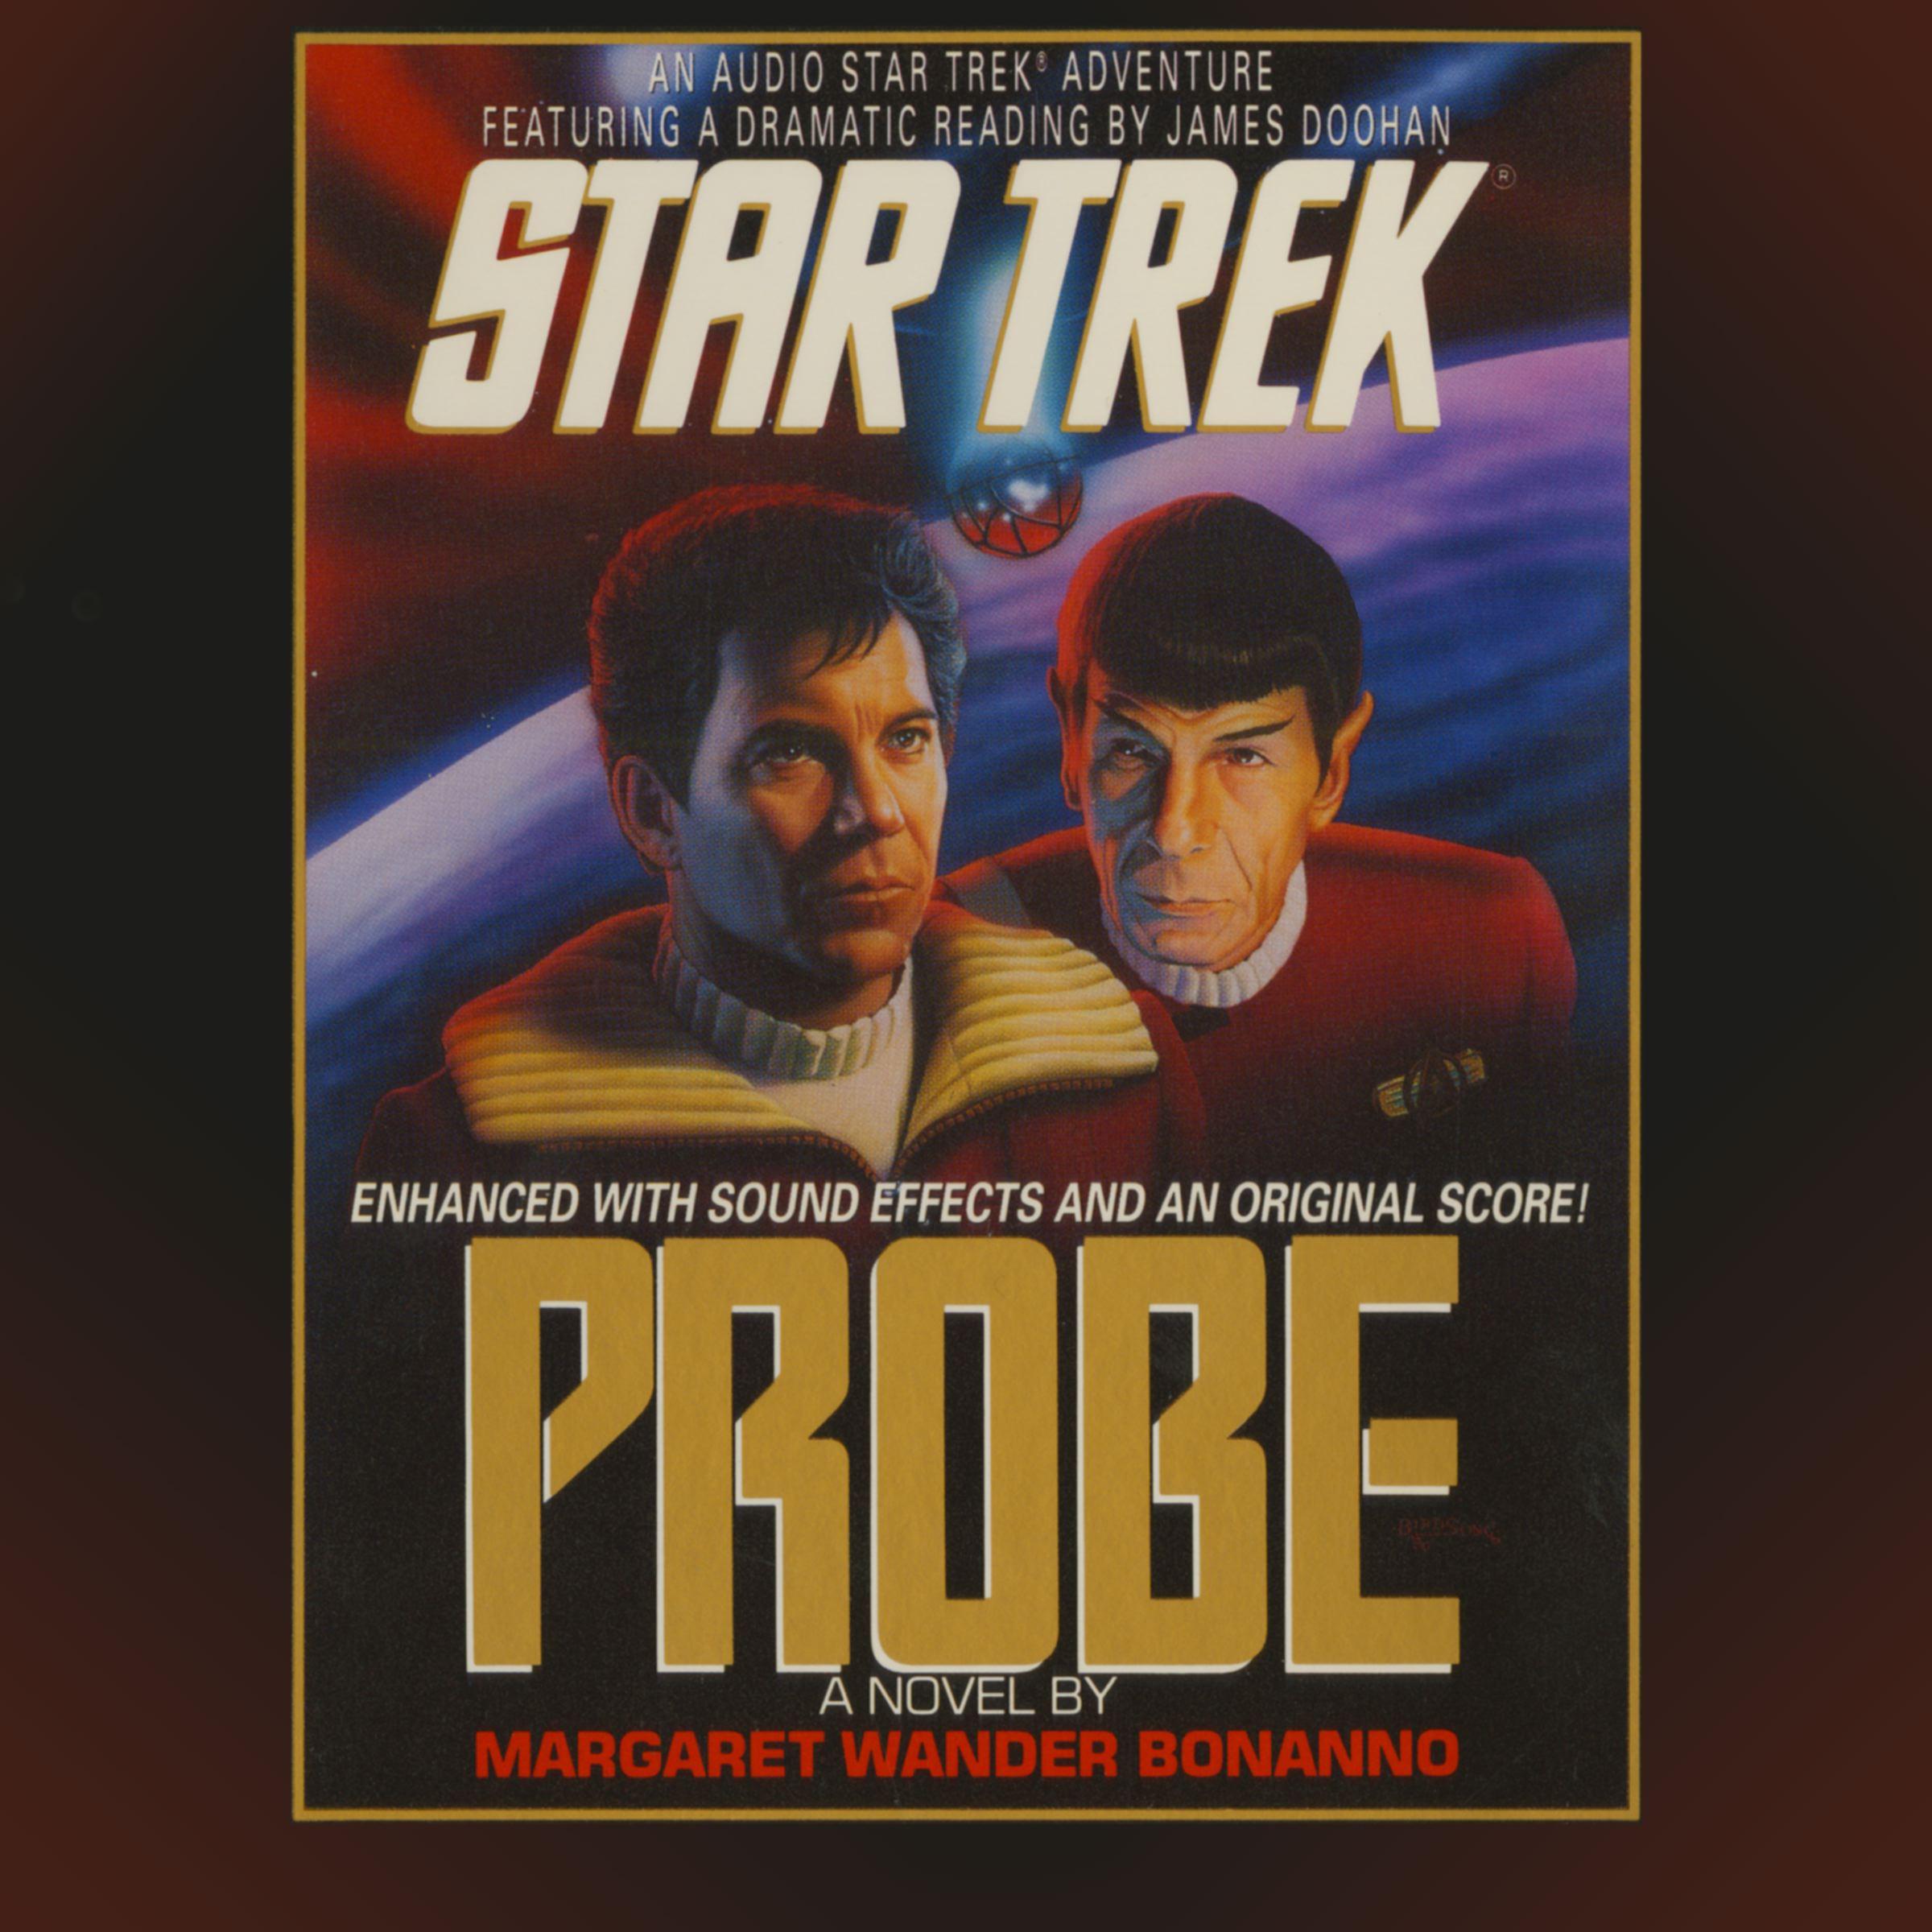 Star trek probe 9781442368323 hr